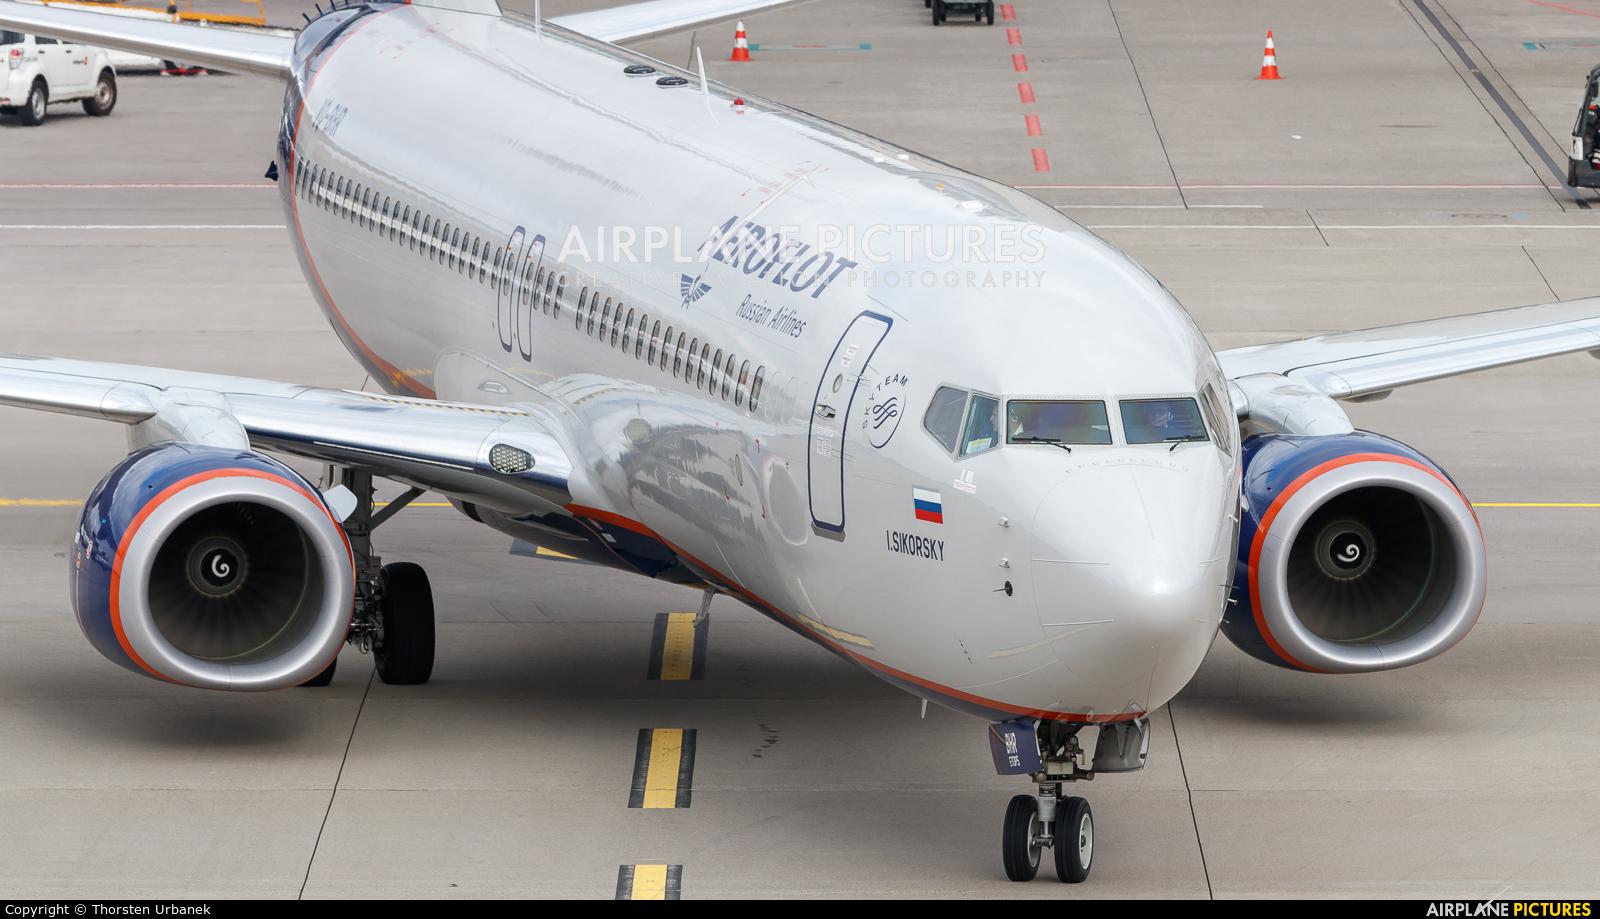 Aeroflot VQ-BHR aircraft at Zurich